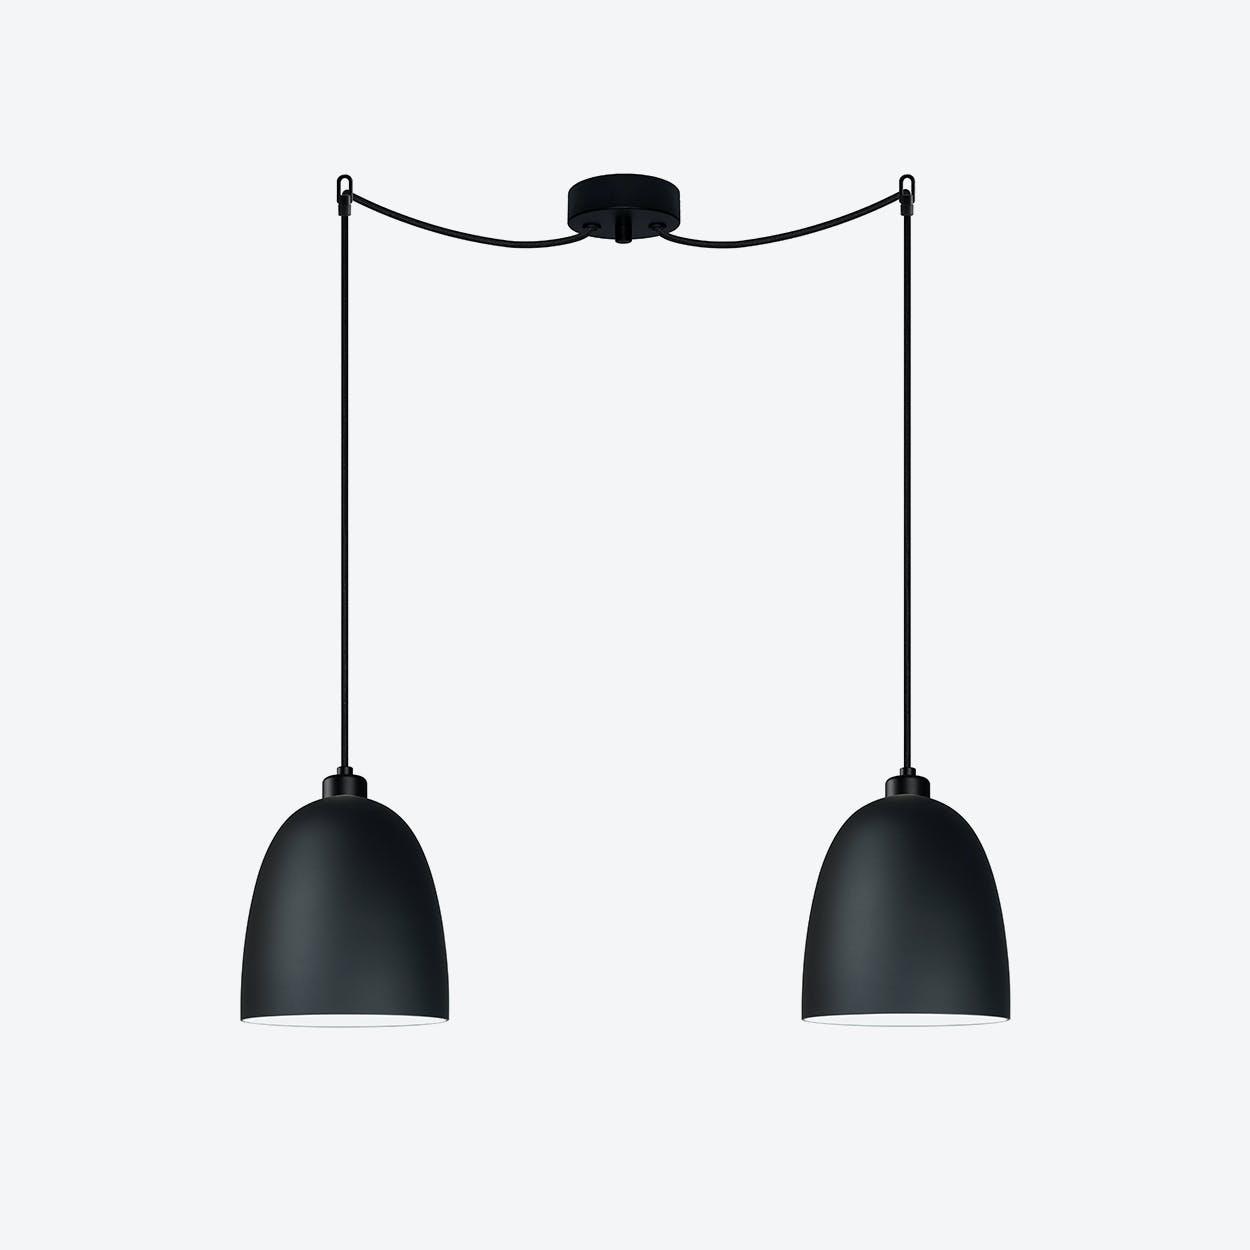 AWA Double Pendant Light in Matte Black